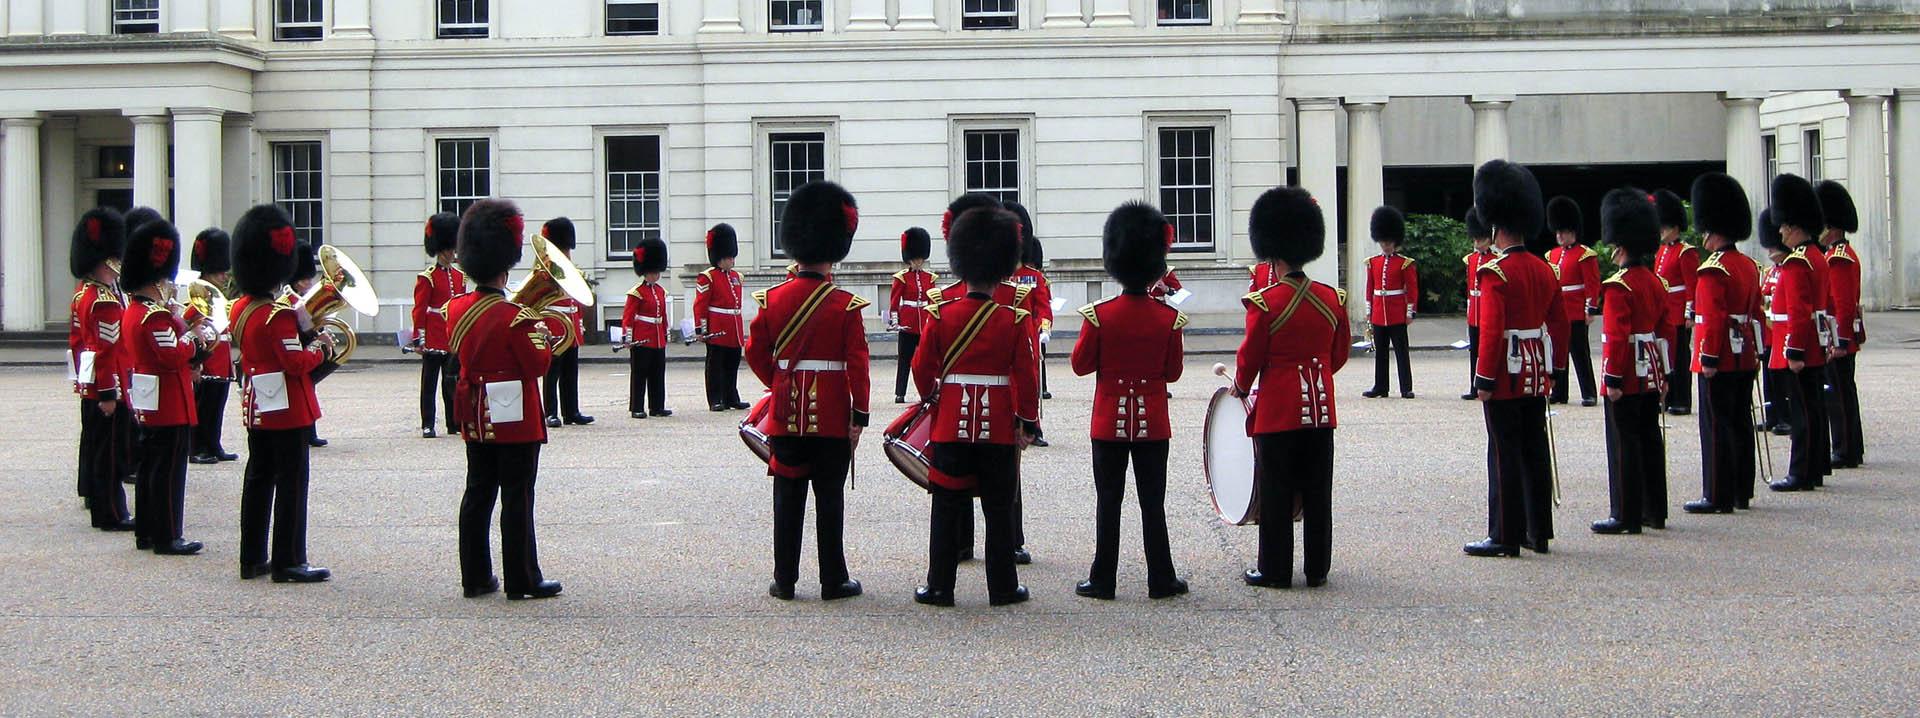 FHC Sprachreisen - England, London - Garde